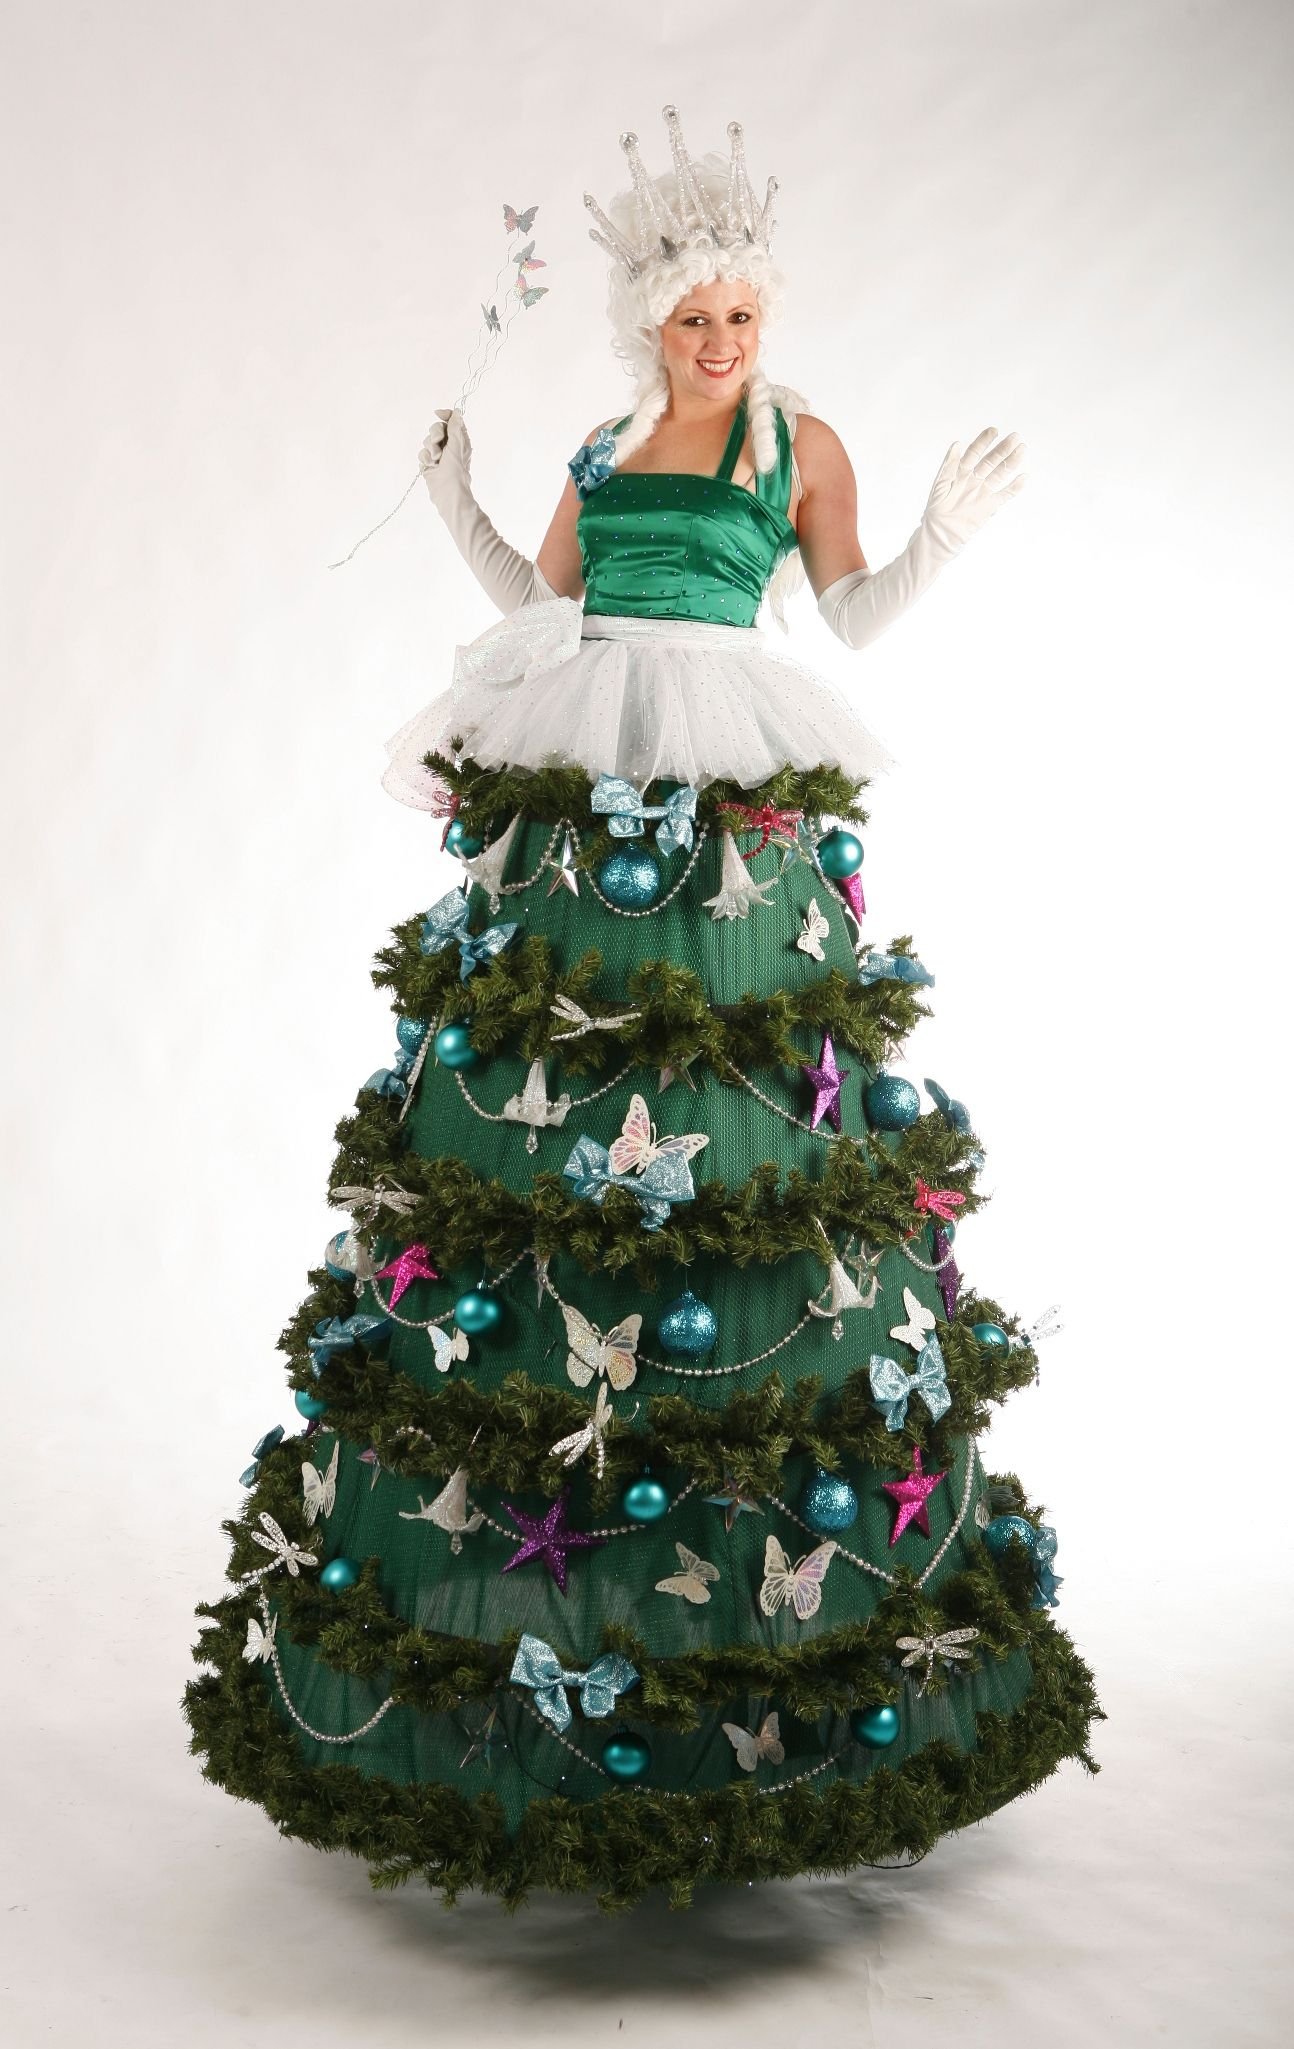 Christmas Tree Fairy Christmas Tree Costume Christmas Tree Fancy Dress Christmas Tree Fairy